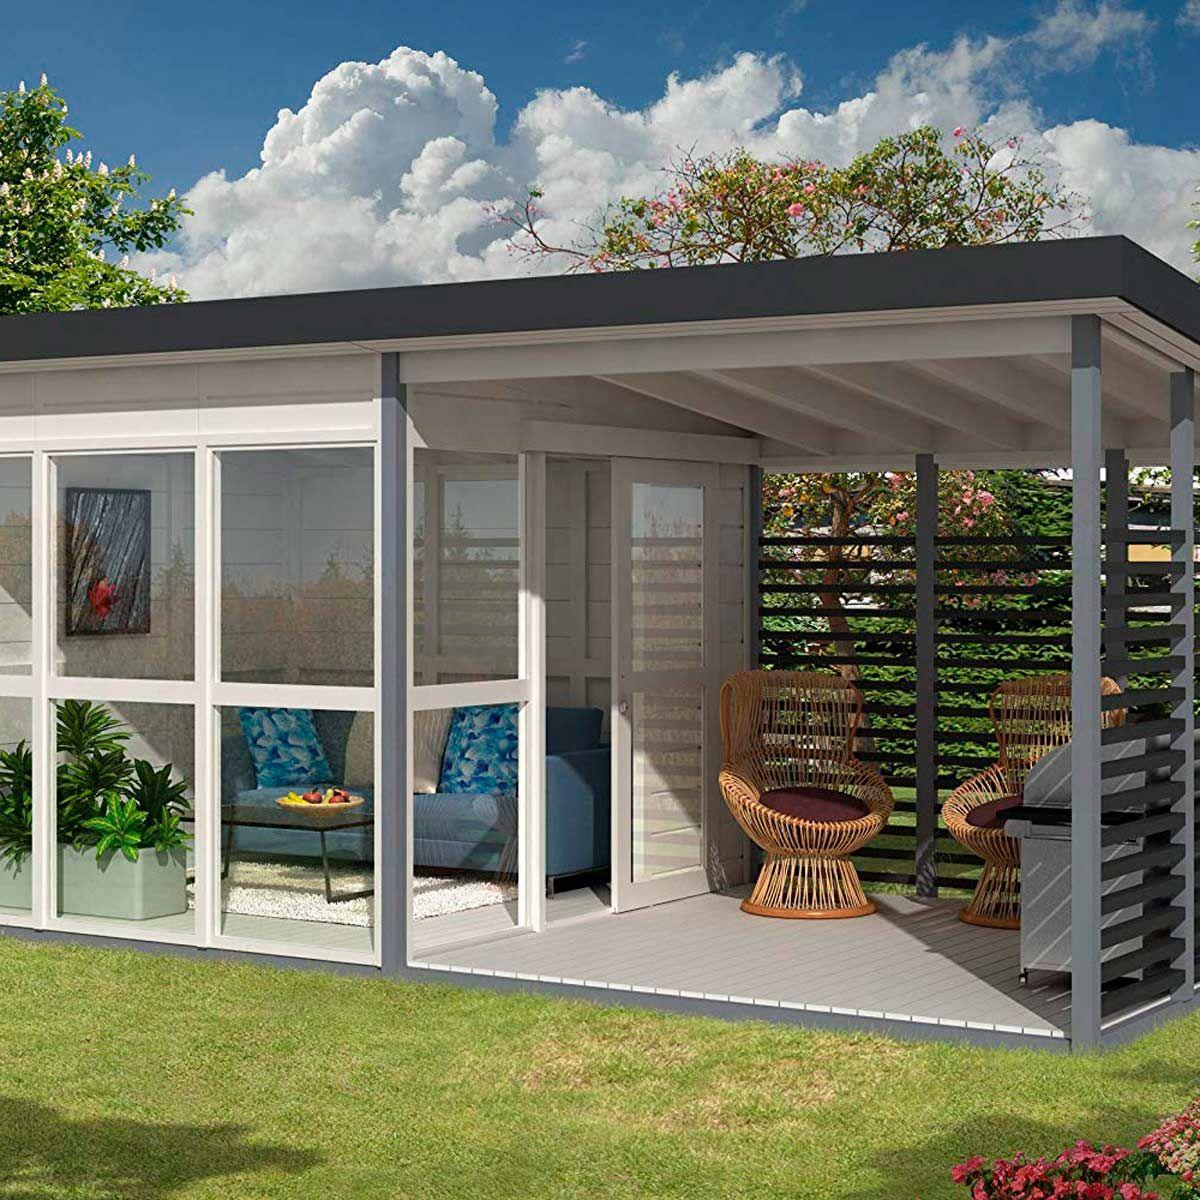 Amazing Cabin Kits You Can Buy On Amazon Backyard Guest Houses Pre Fab Tiny House Backyard House